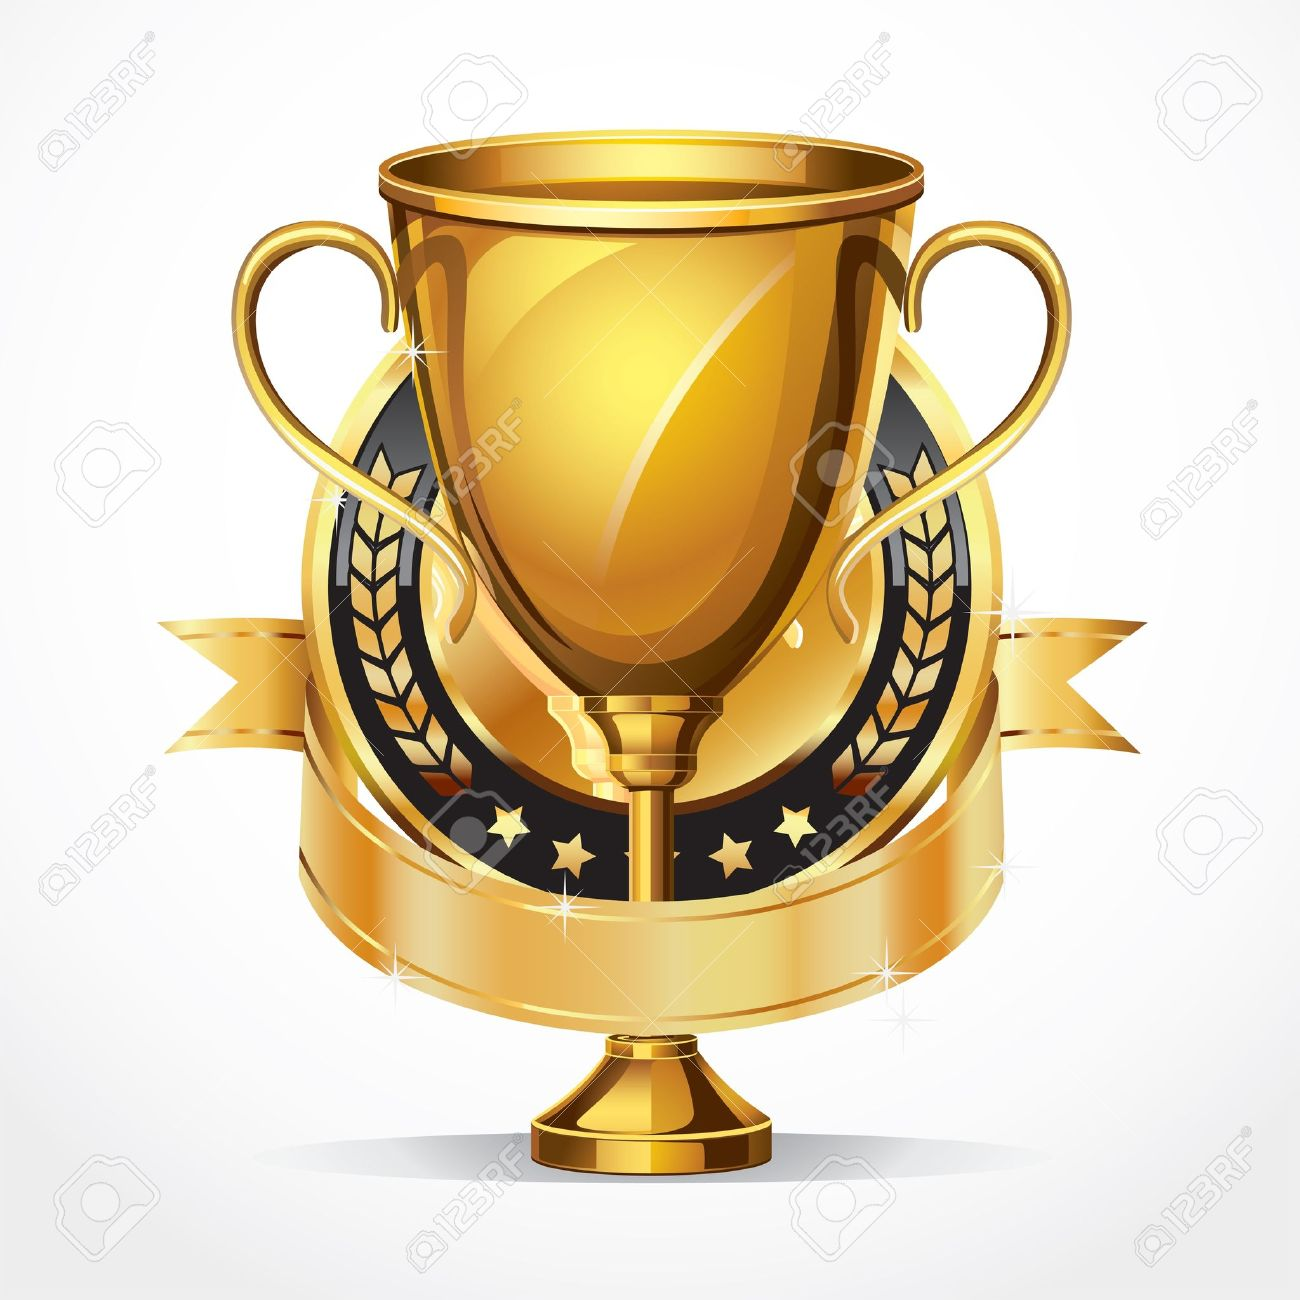 Golden award trophy and Medal illustration Stock Vector - 13926971